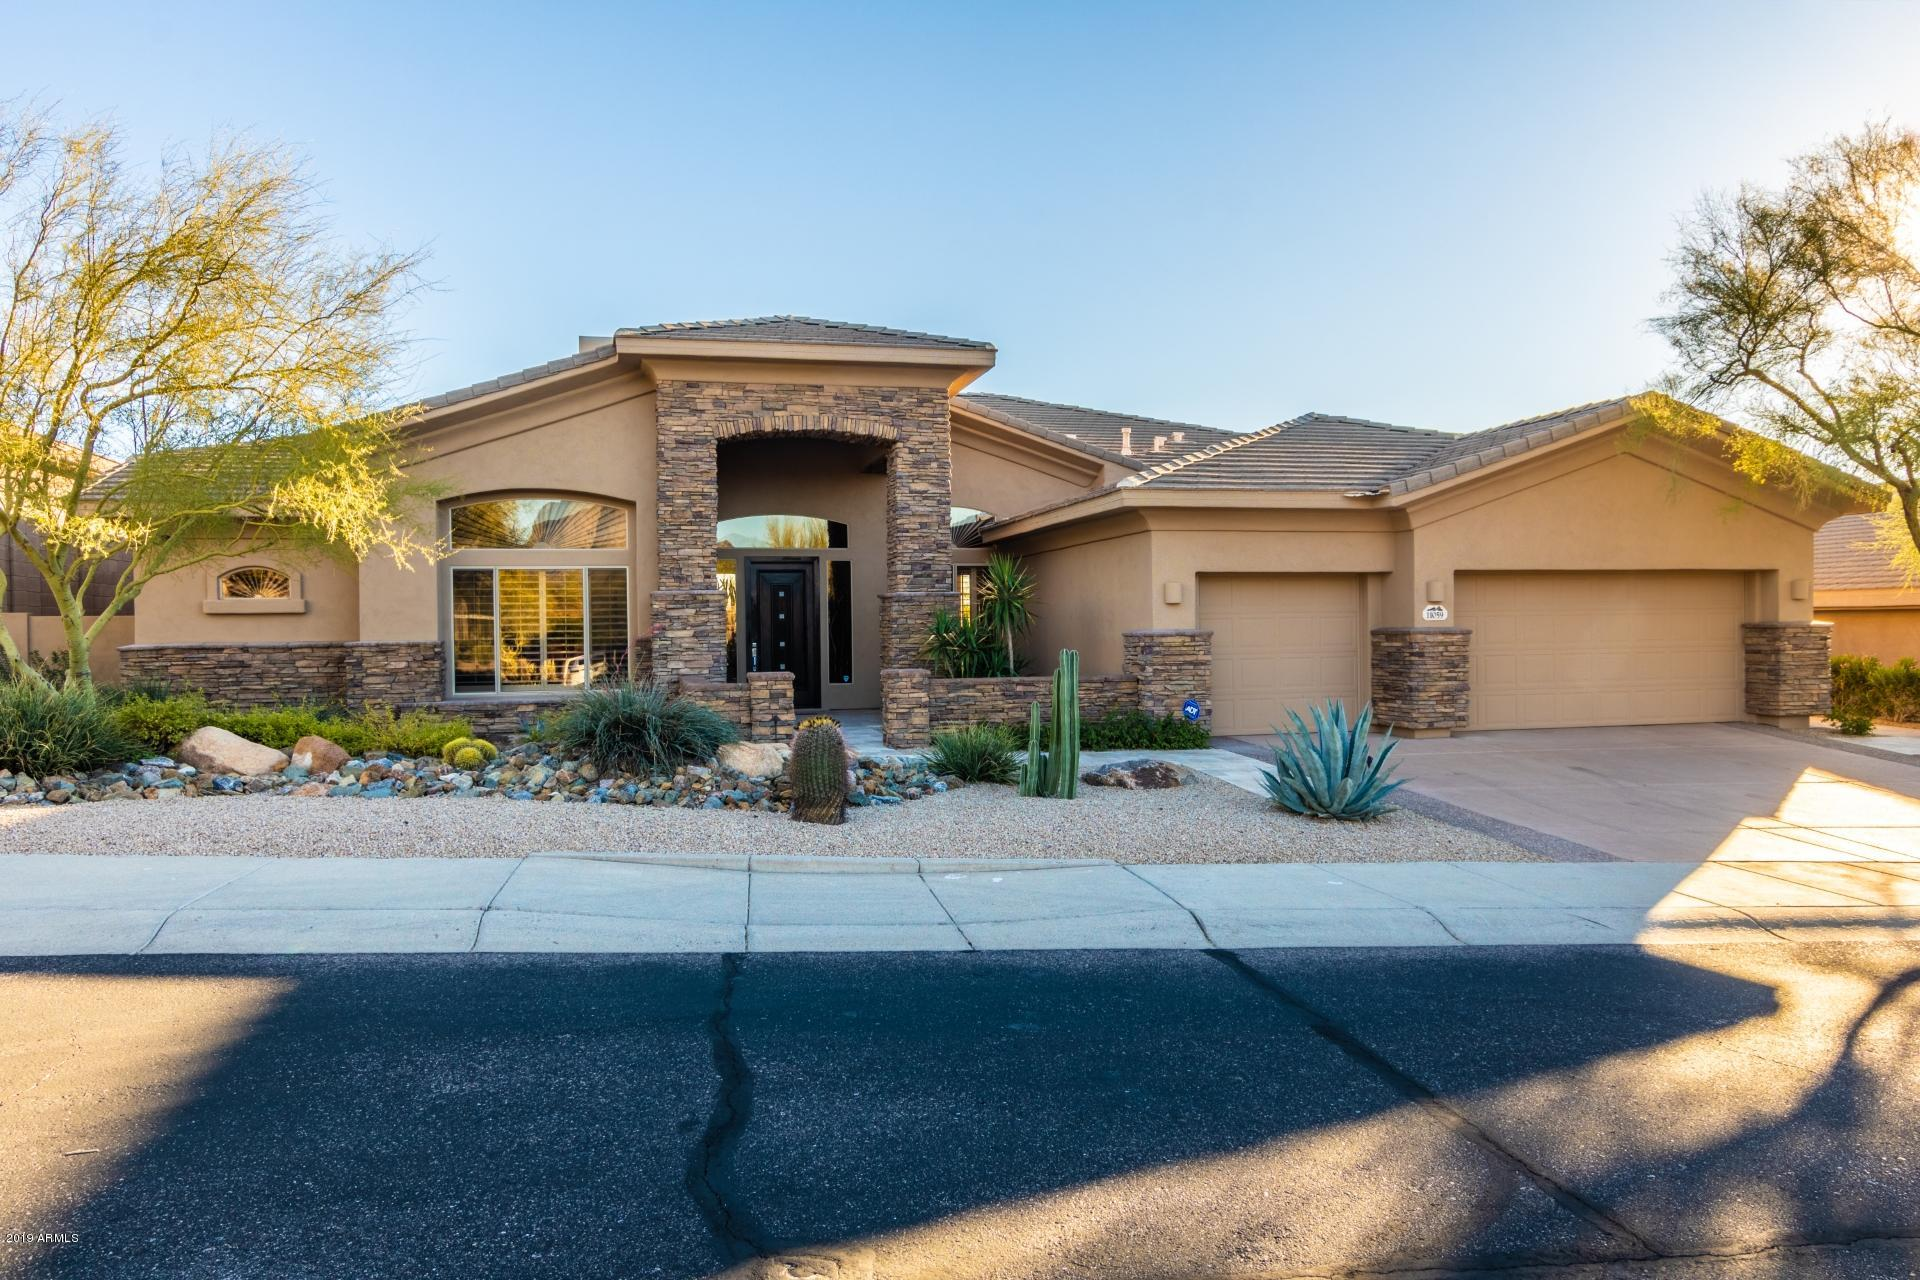 Photo of 11059 E Acoma Drive, Scottsdale, AZ 85255